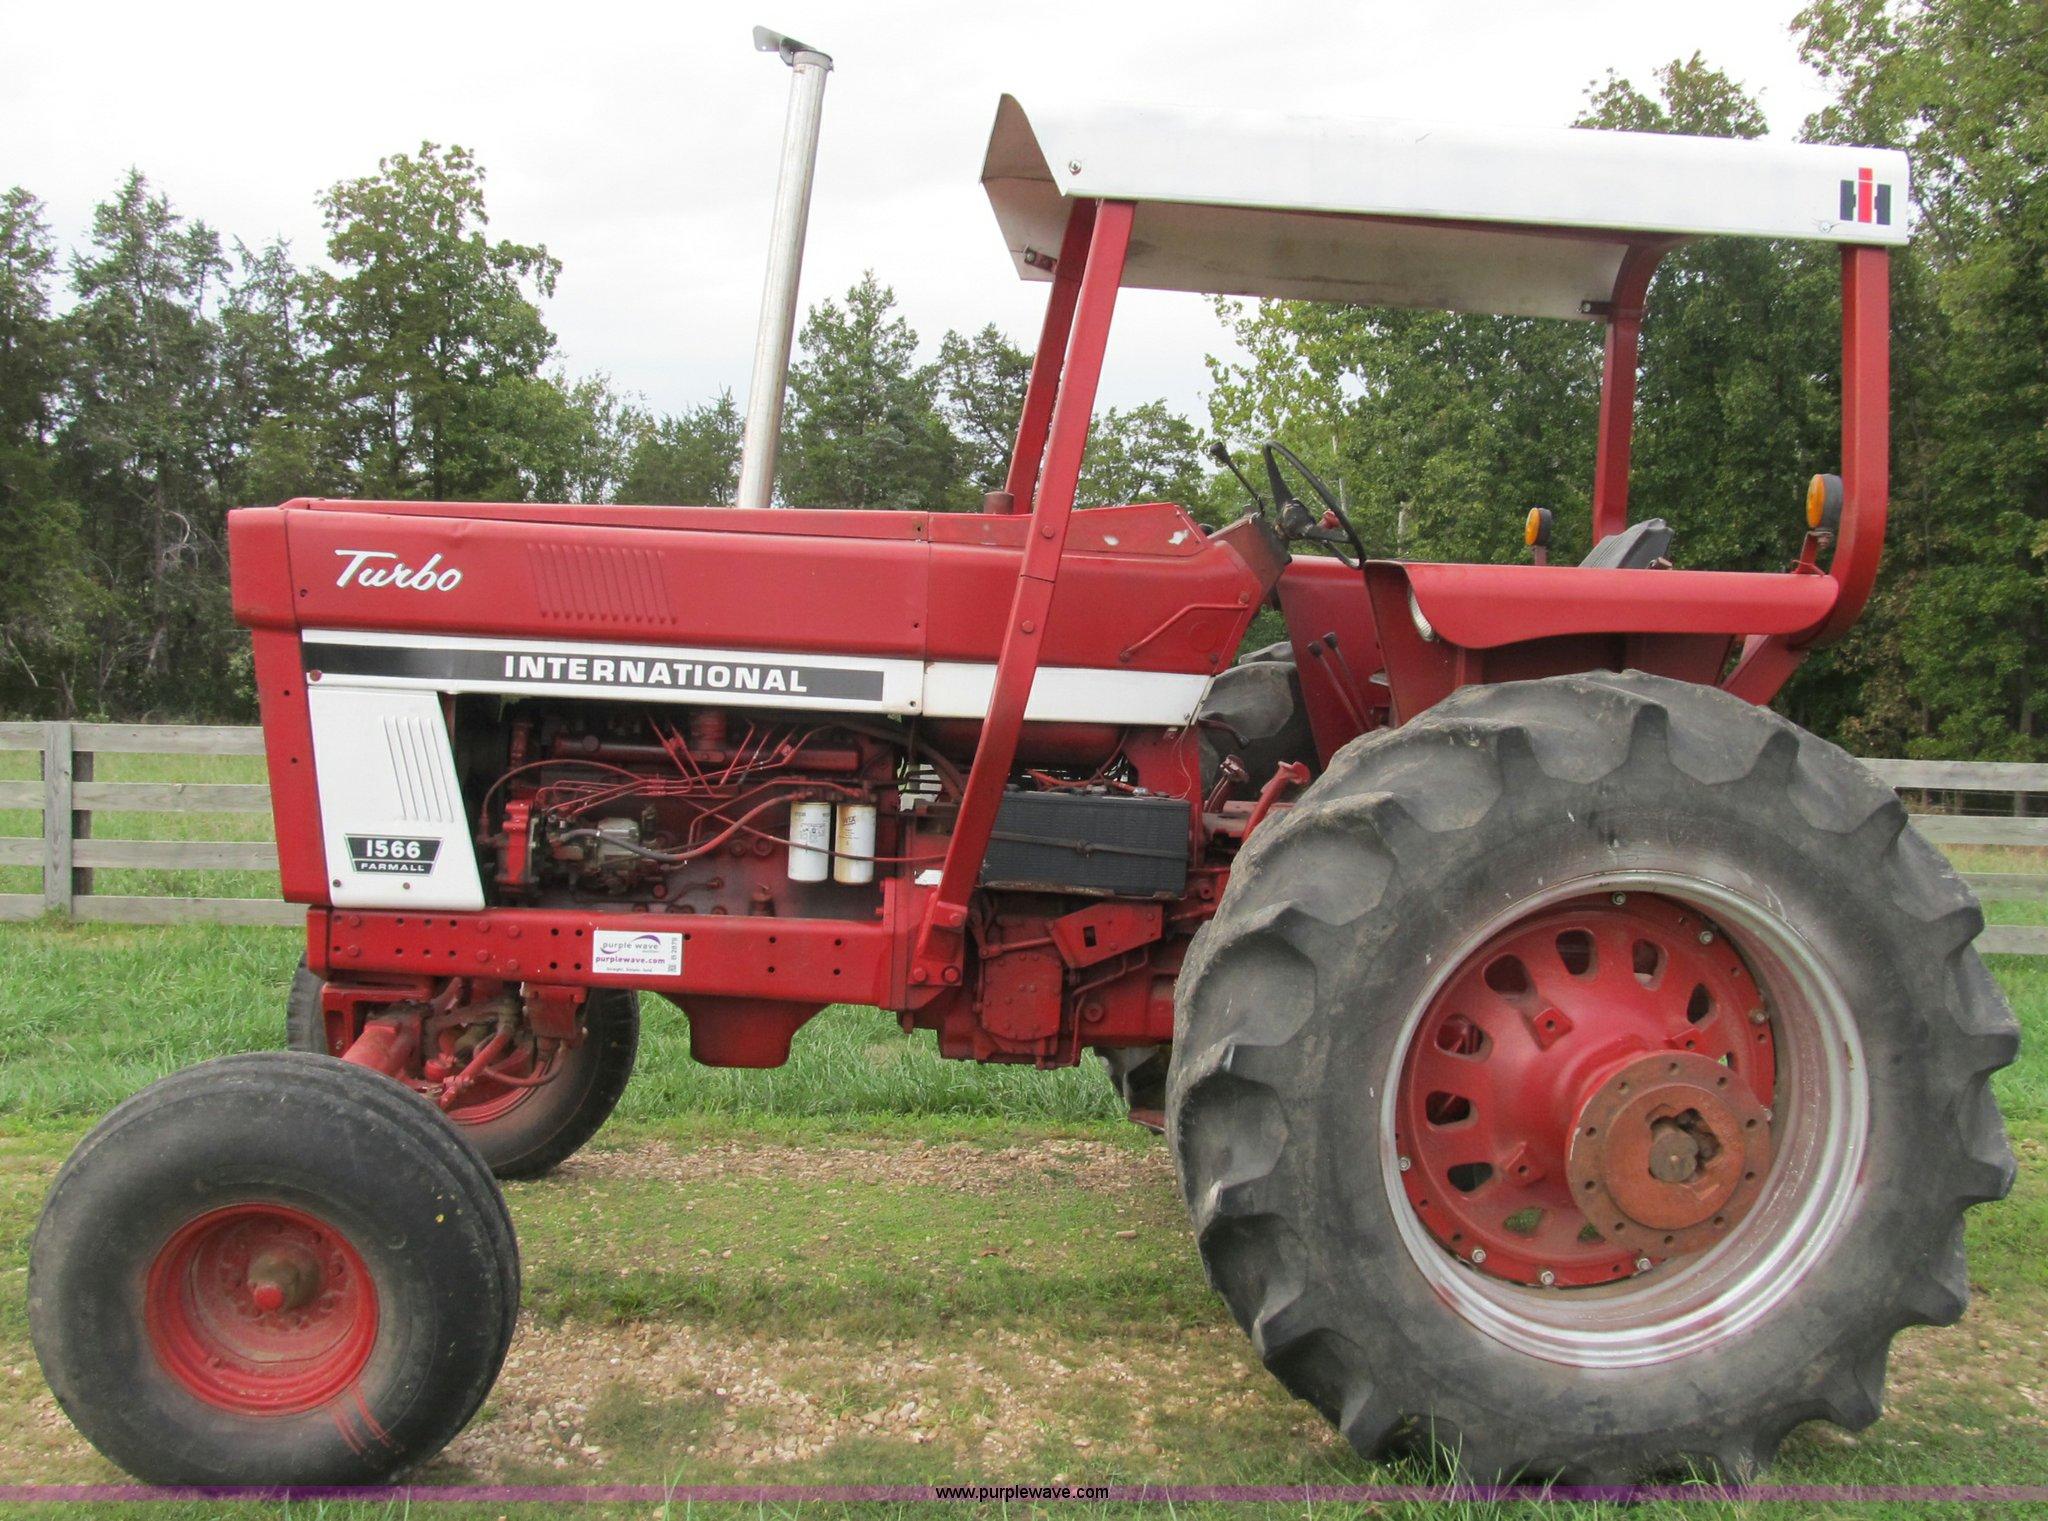 1975 International Farmall 1566 tractor | Item B2879 | SOLD!... on